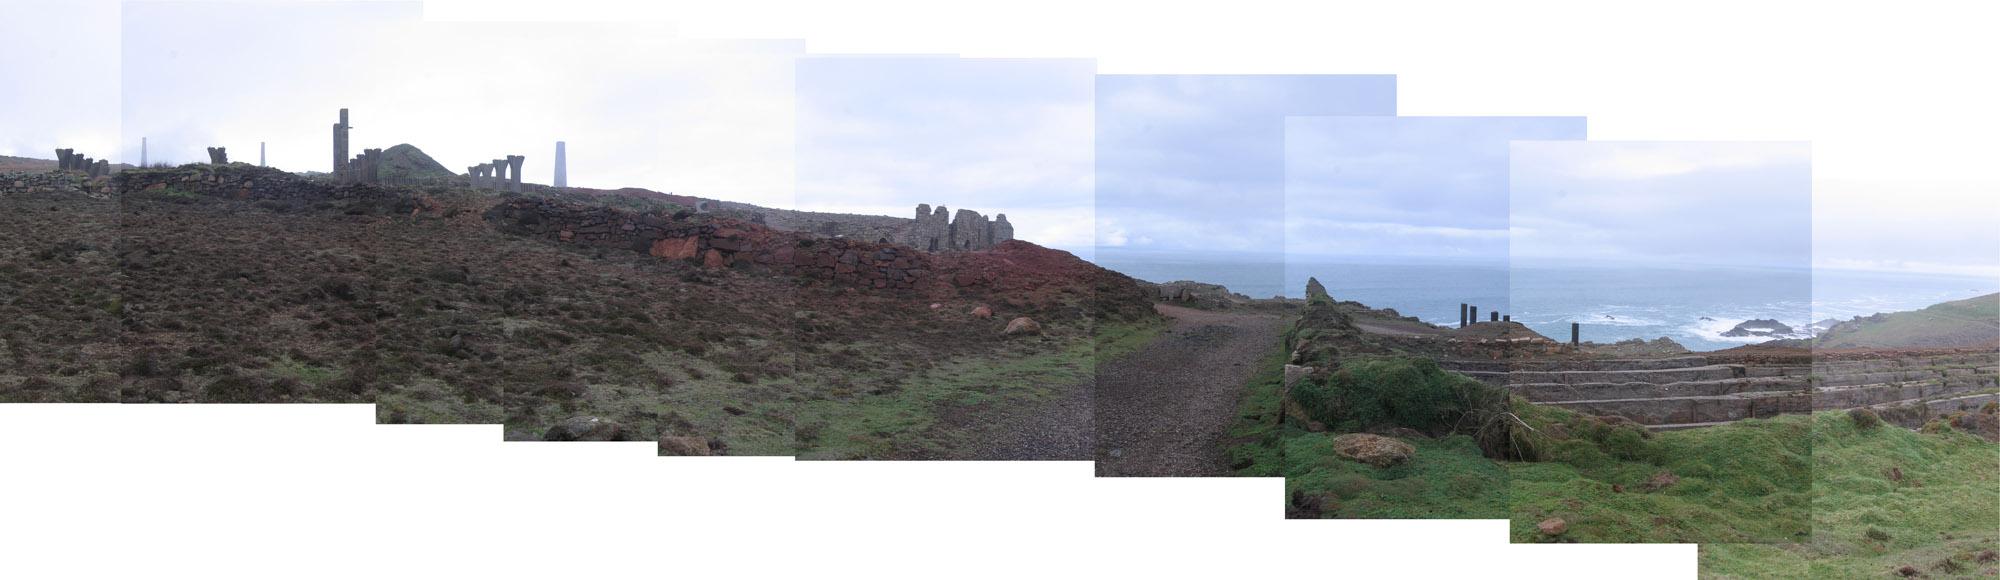 mining ruins near Botallack, joiner photograph